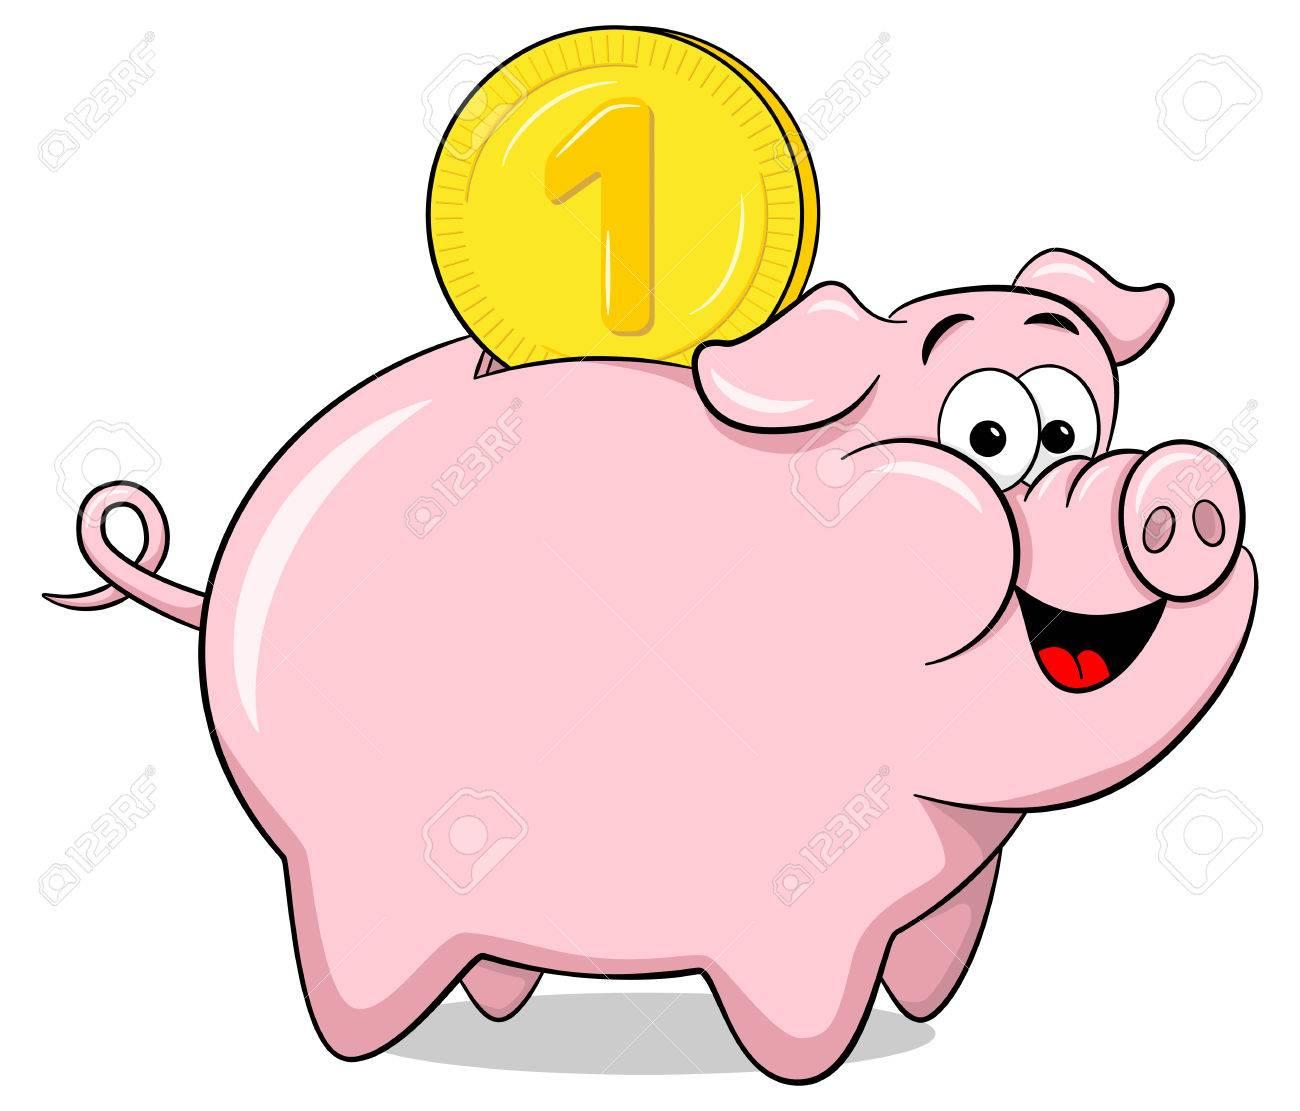 vector illustration of a cartoon piggy bank - 58384058